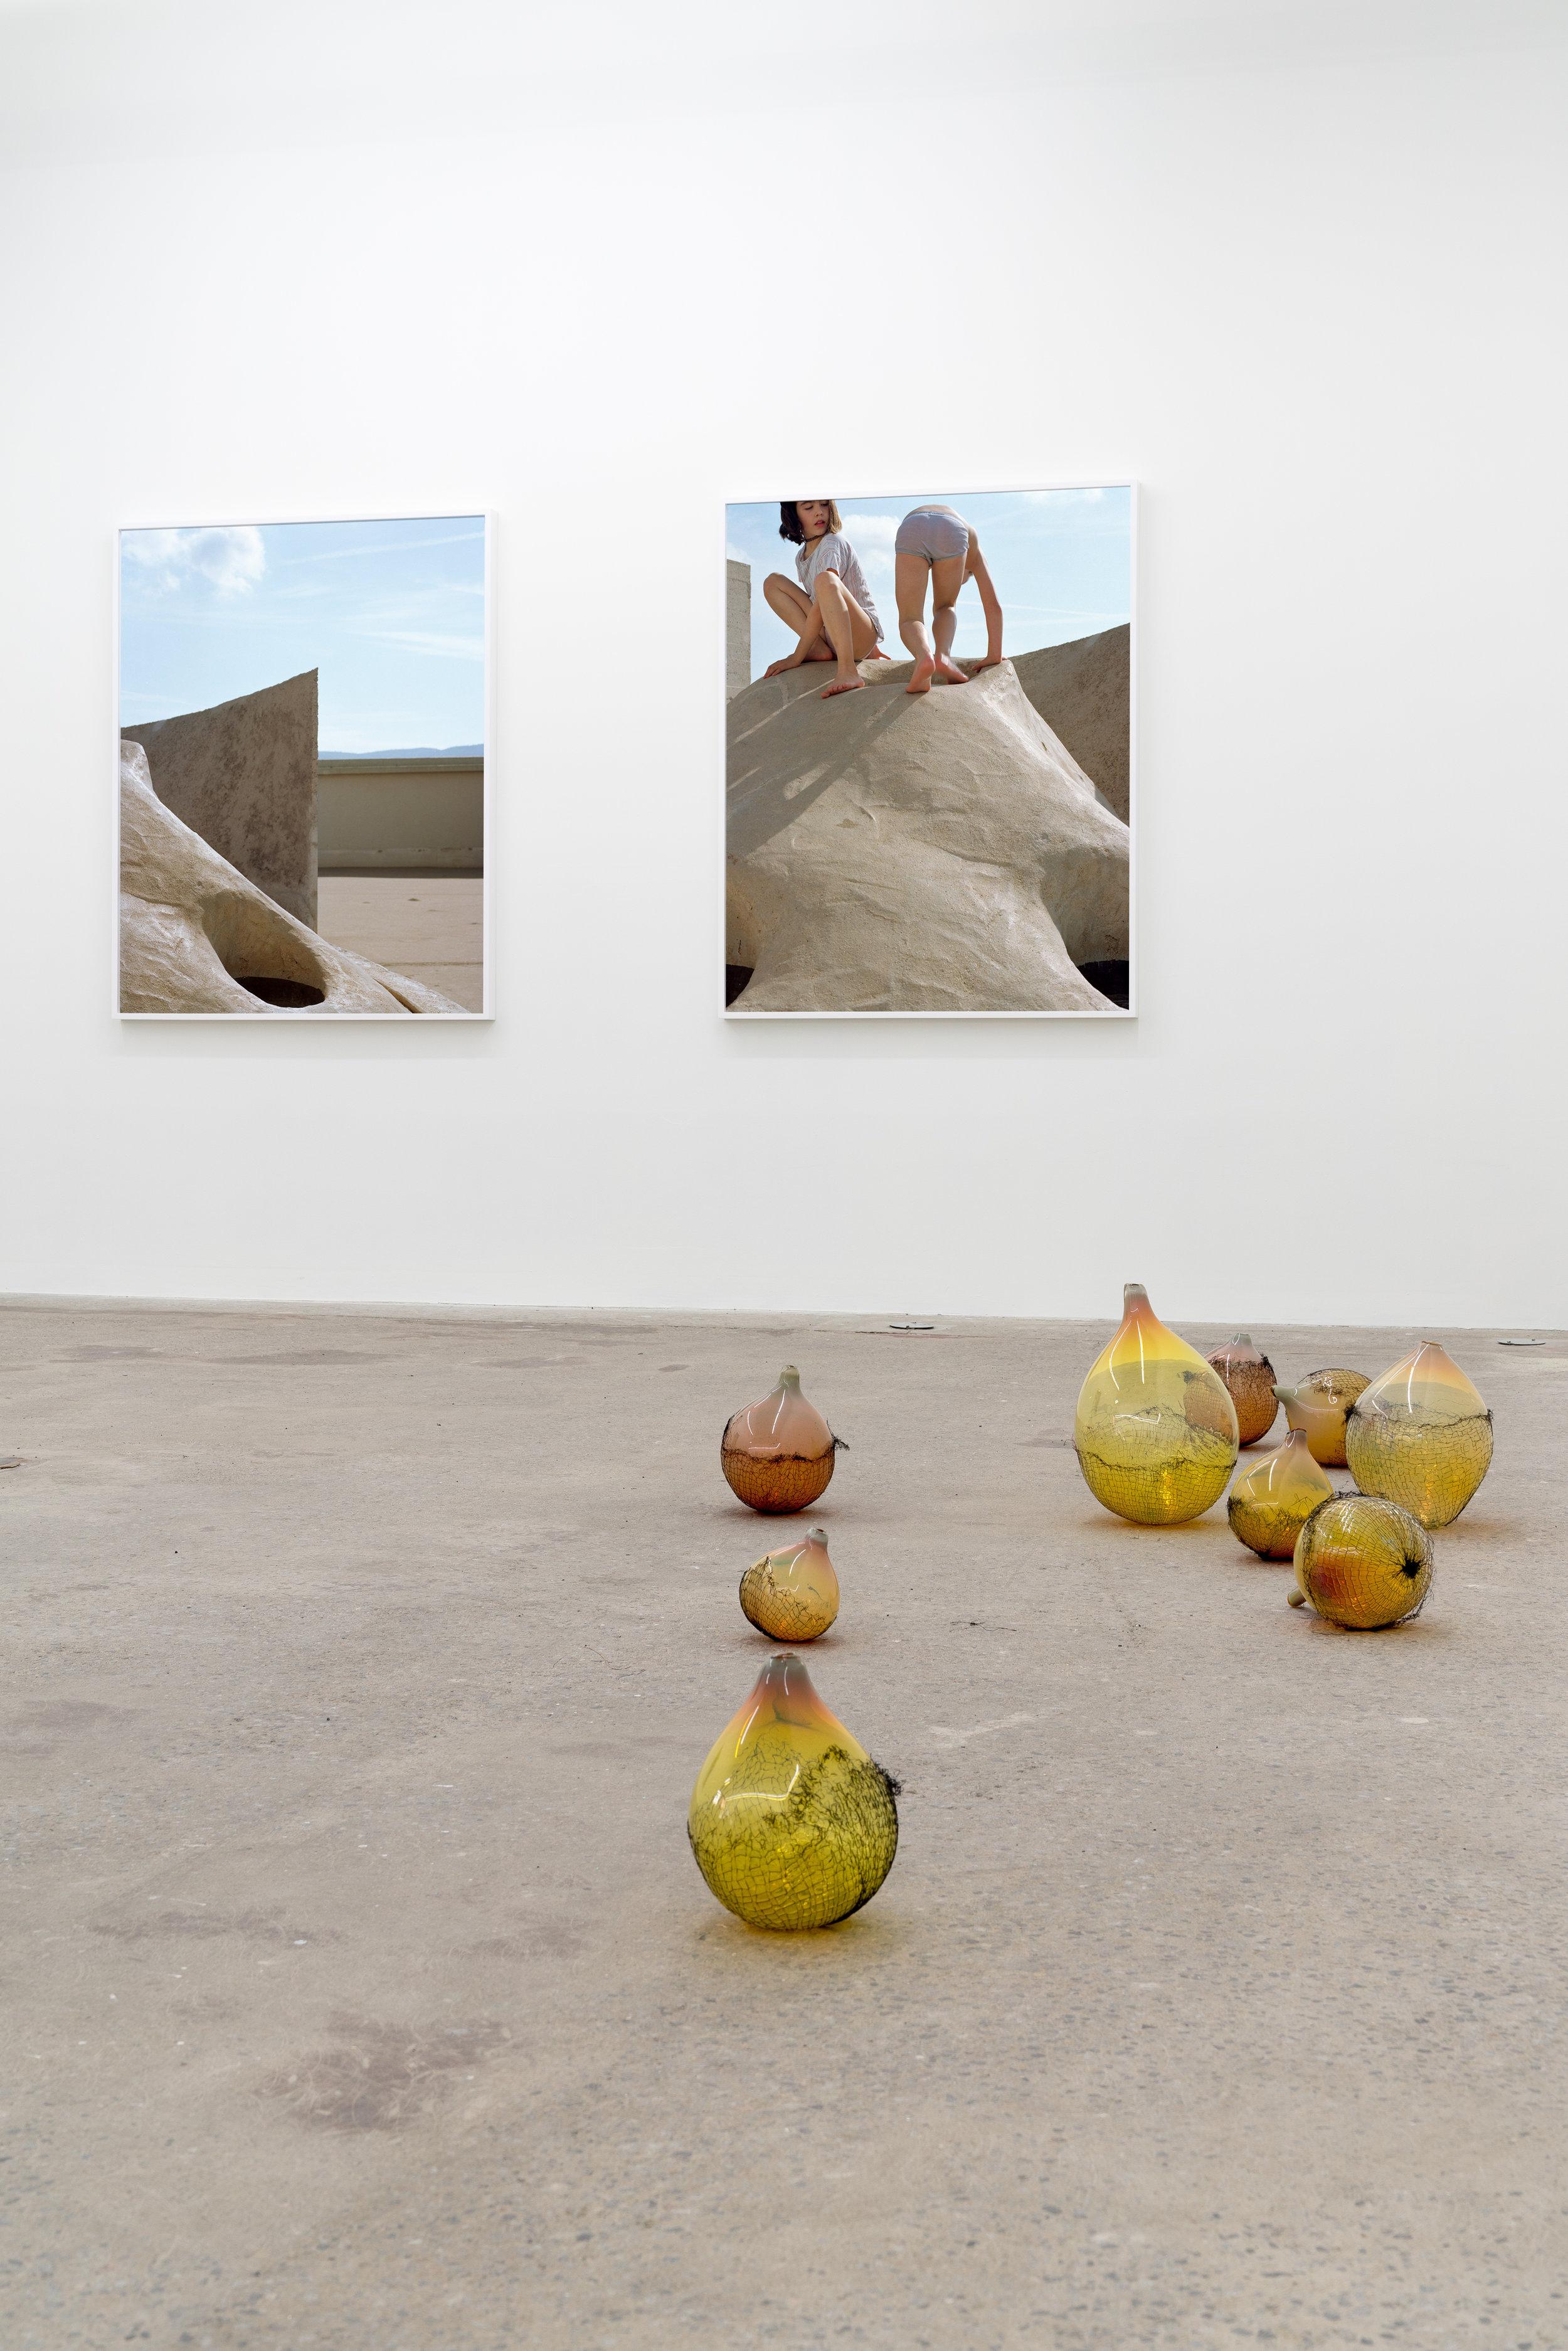 Lorna Bauer,  Tools for Idlers , 2018, vue d'exposition, Galerie Nicolas Robert, photo : Jean-Michael Seminaro